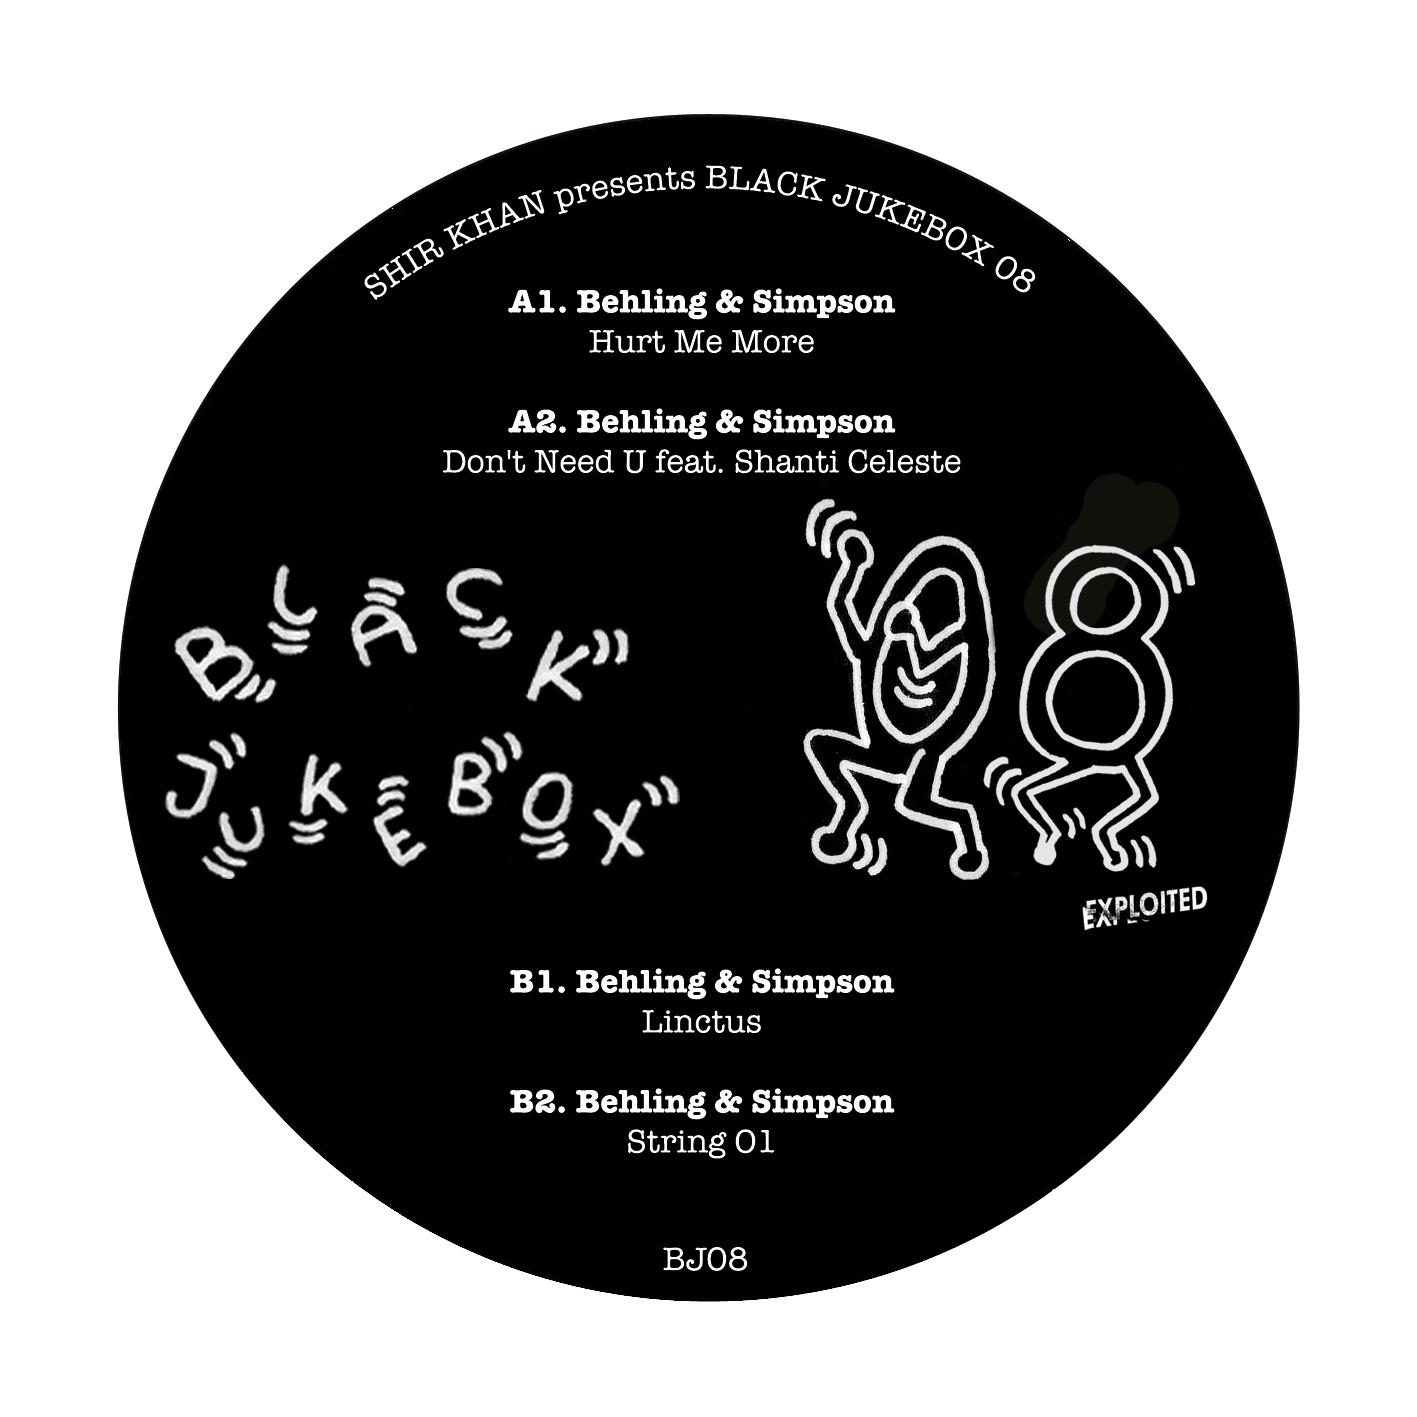 Black-Jukebox-08